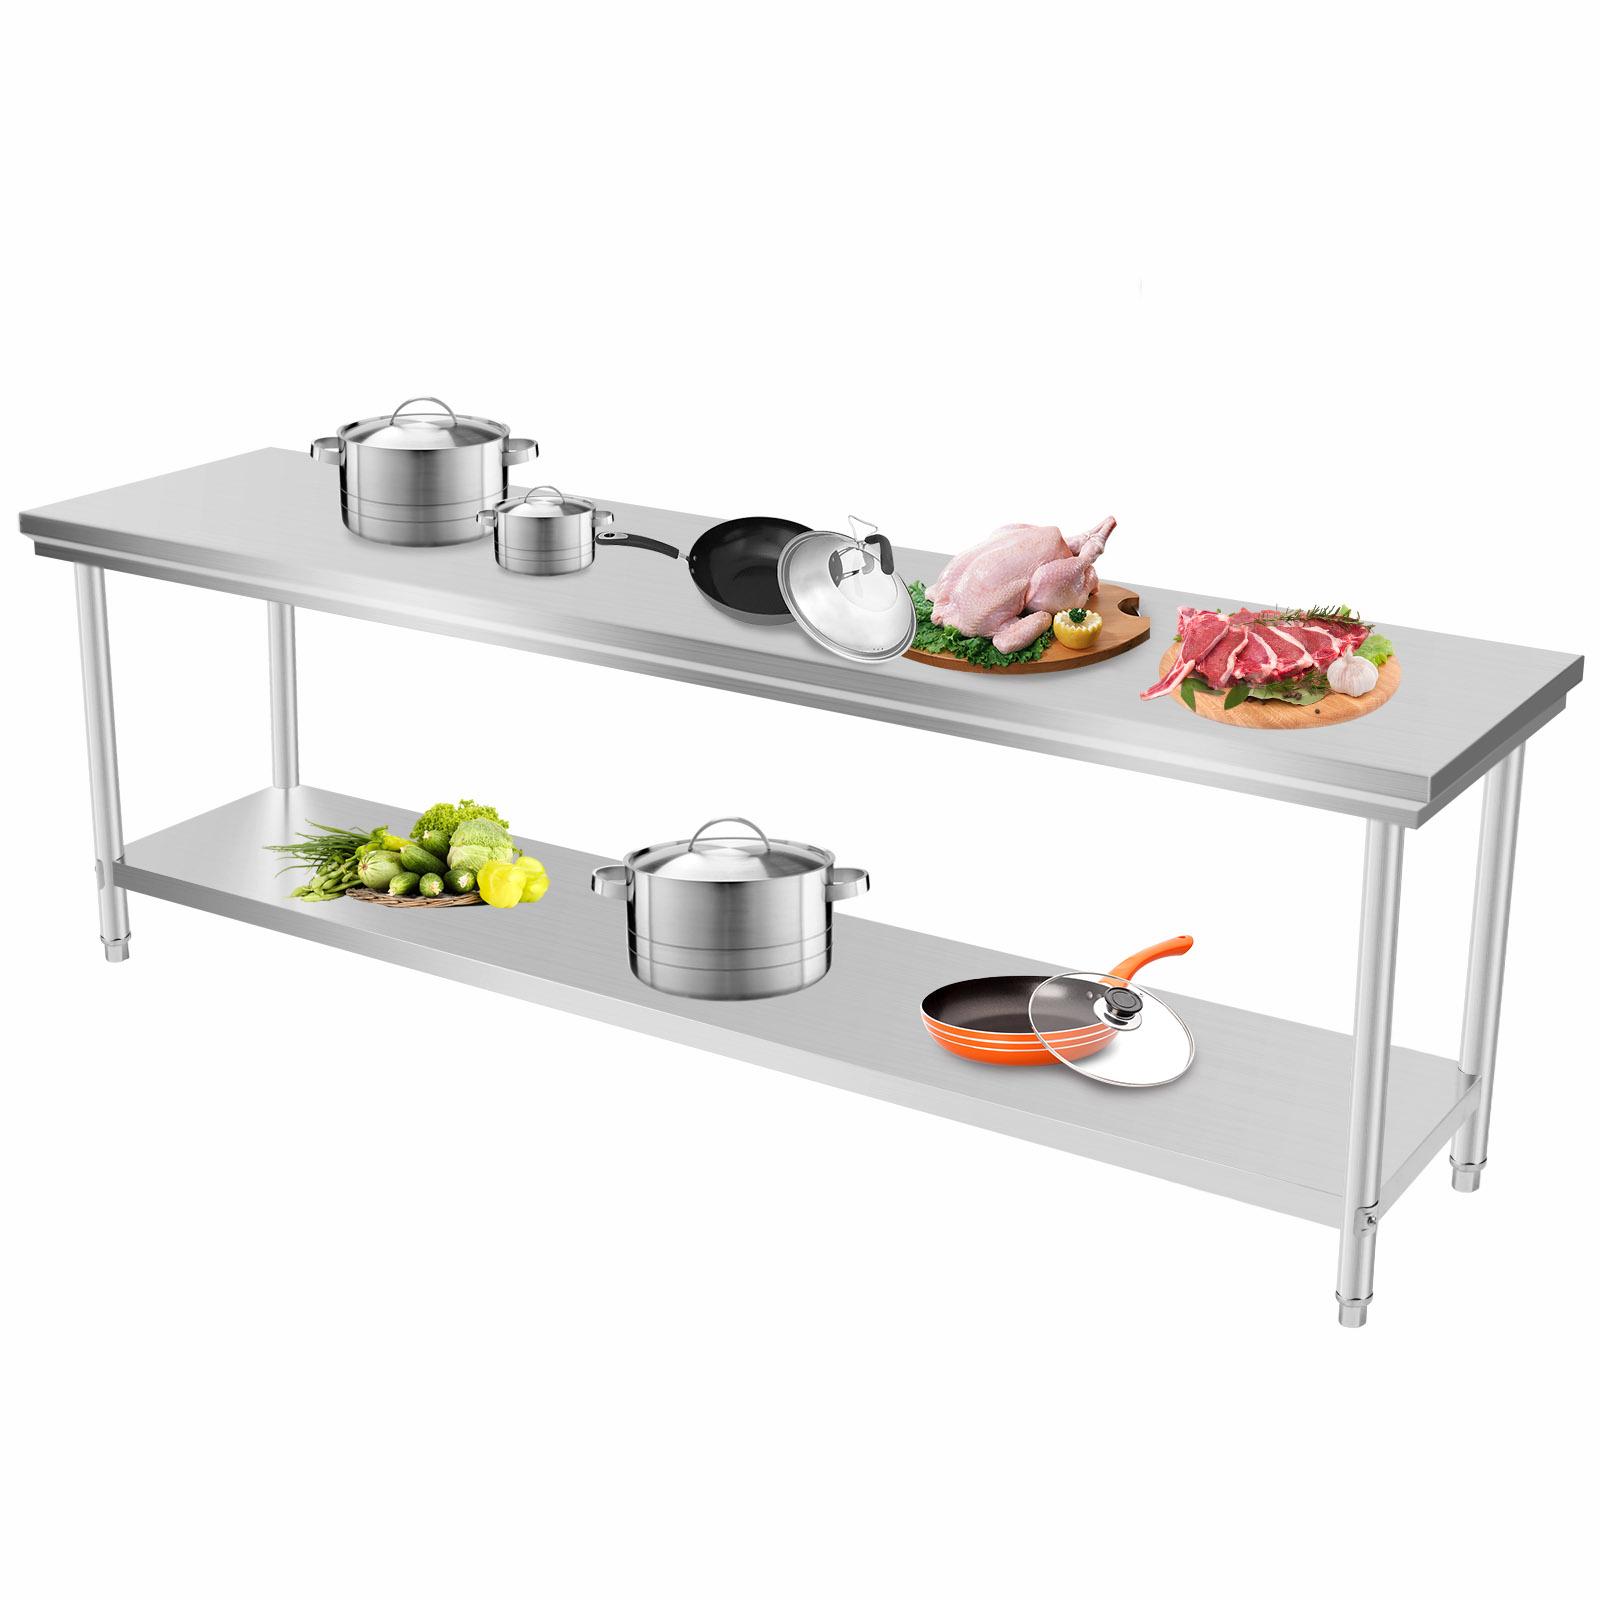 Vevor 201 commercial stainless steel kitchen work bench for Kitchen work